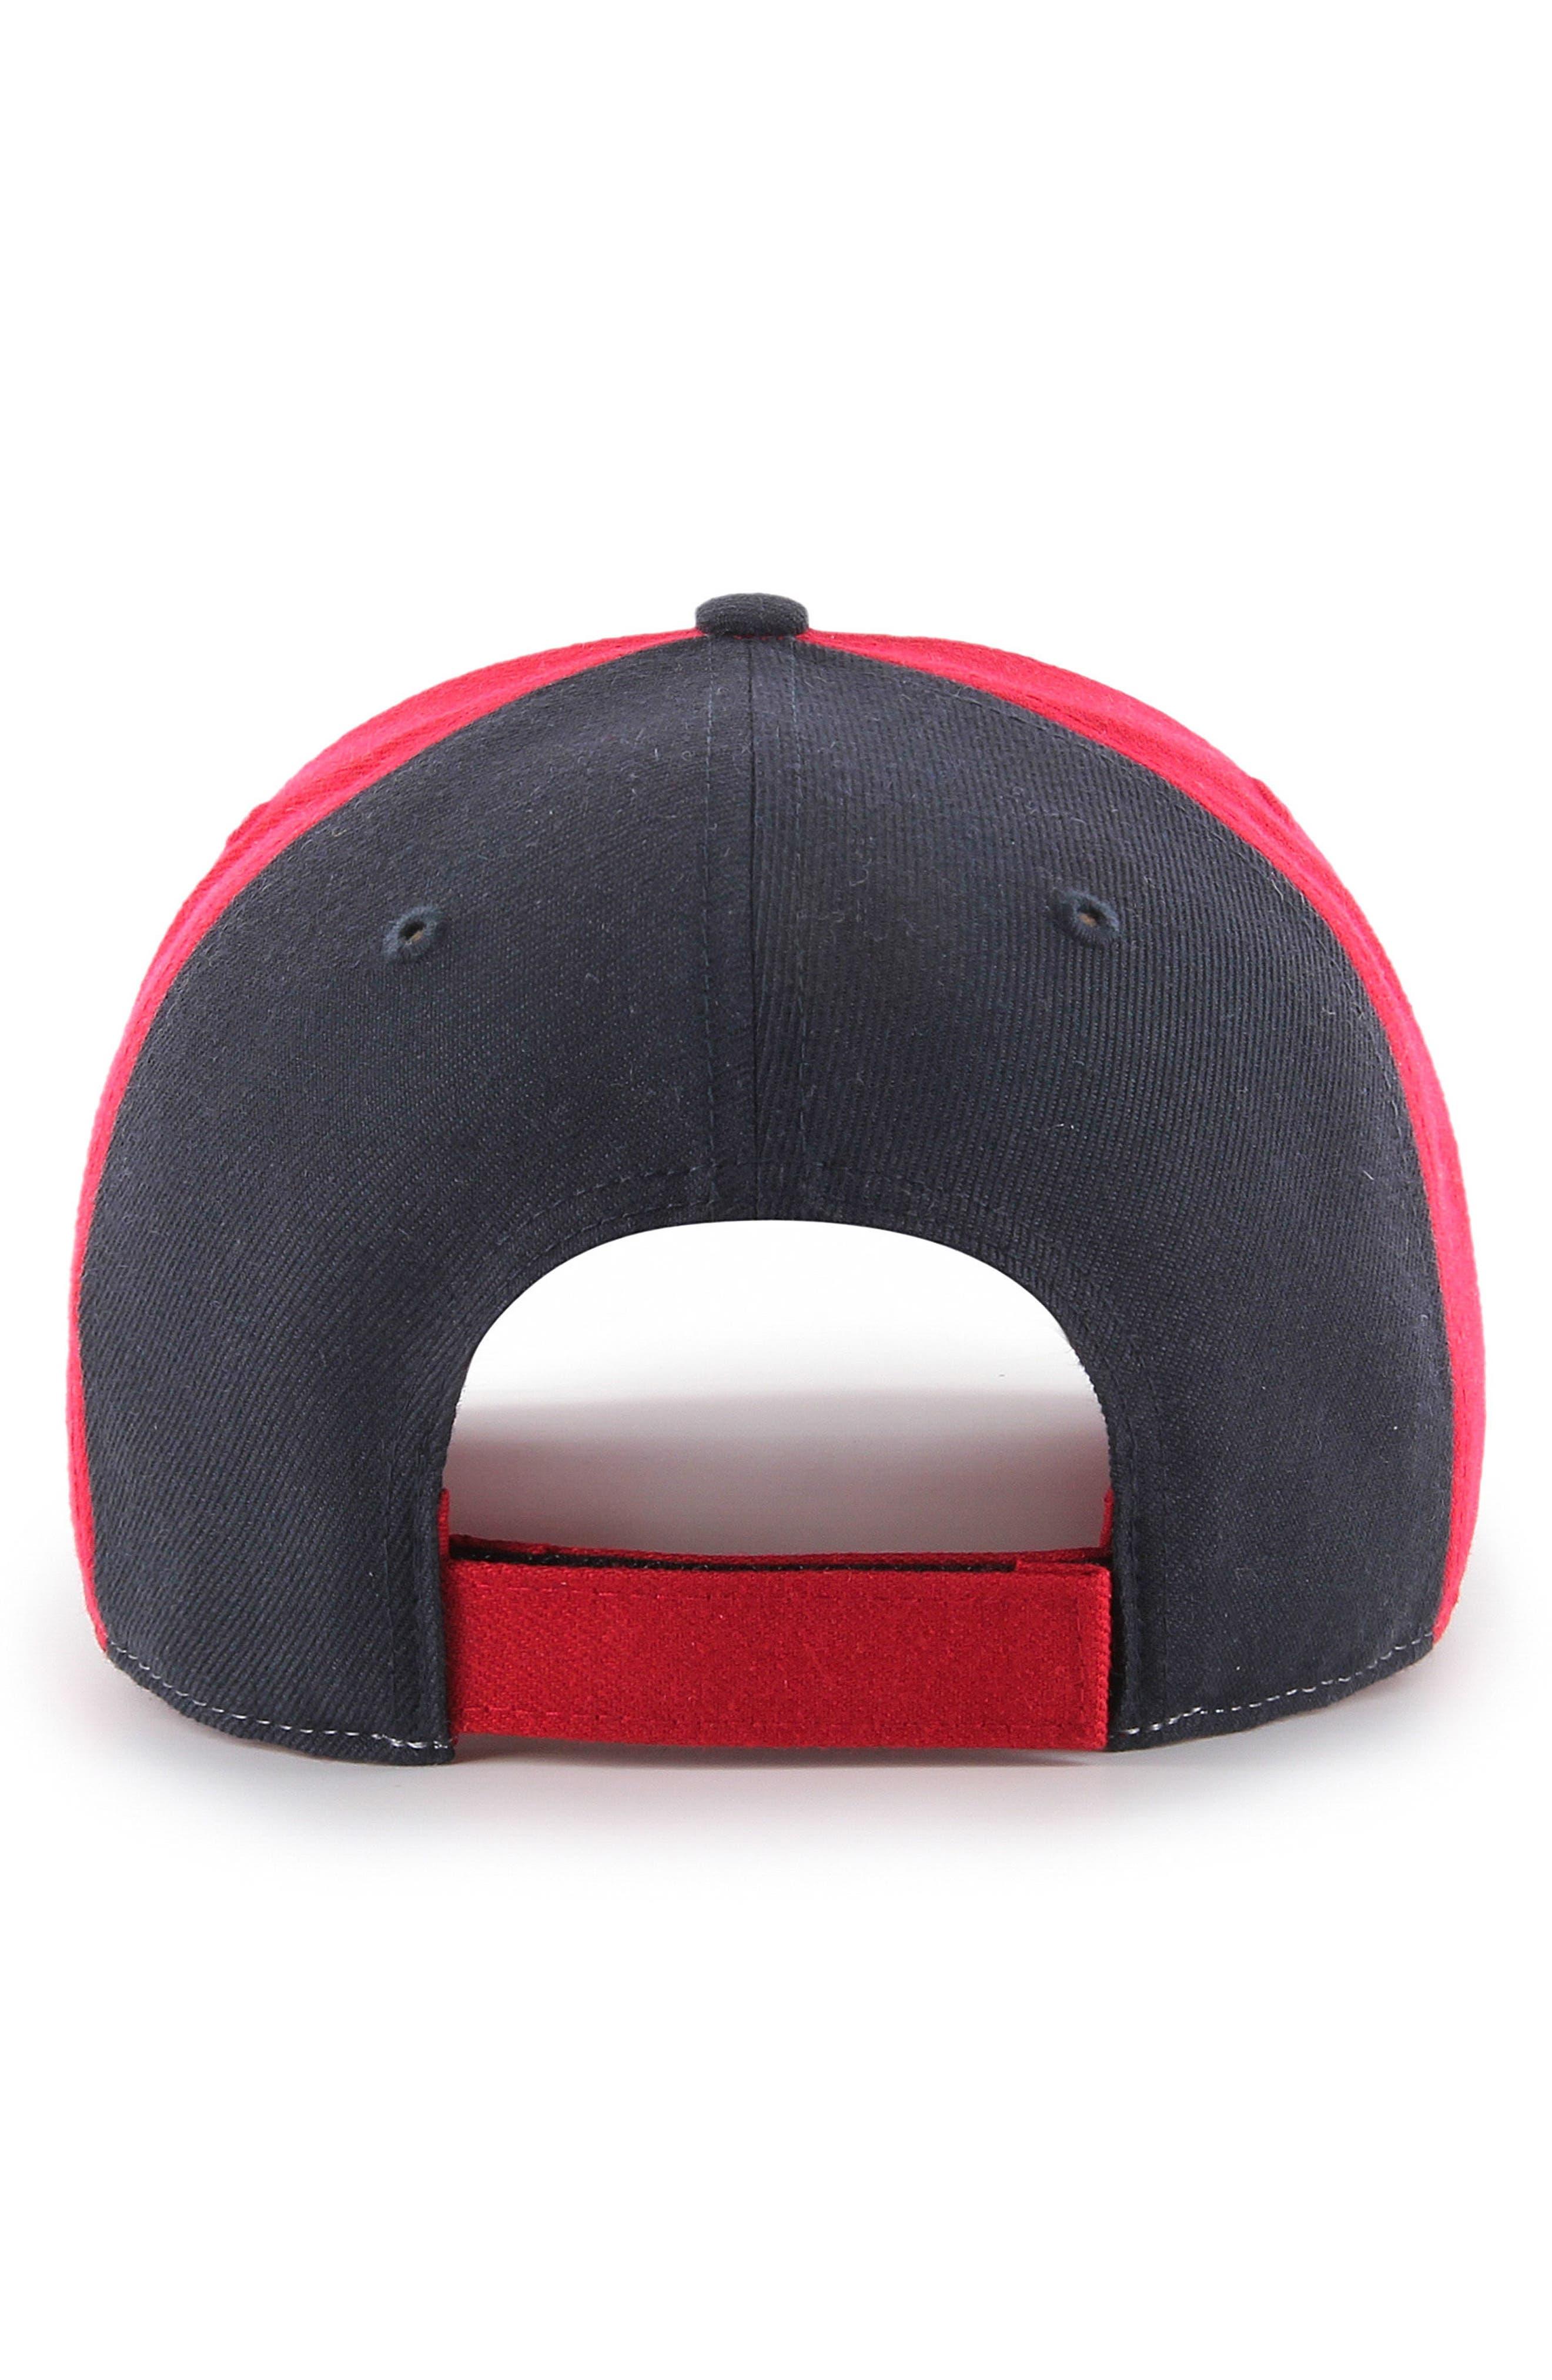 Reresto MLB Ball Cap,                             Alternate thumbnail 6, color,